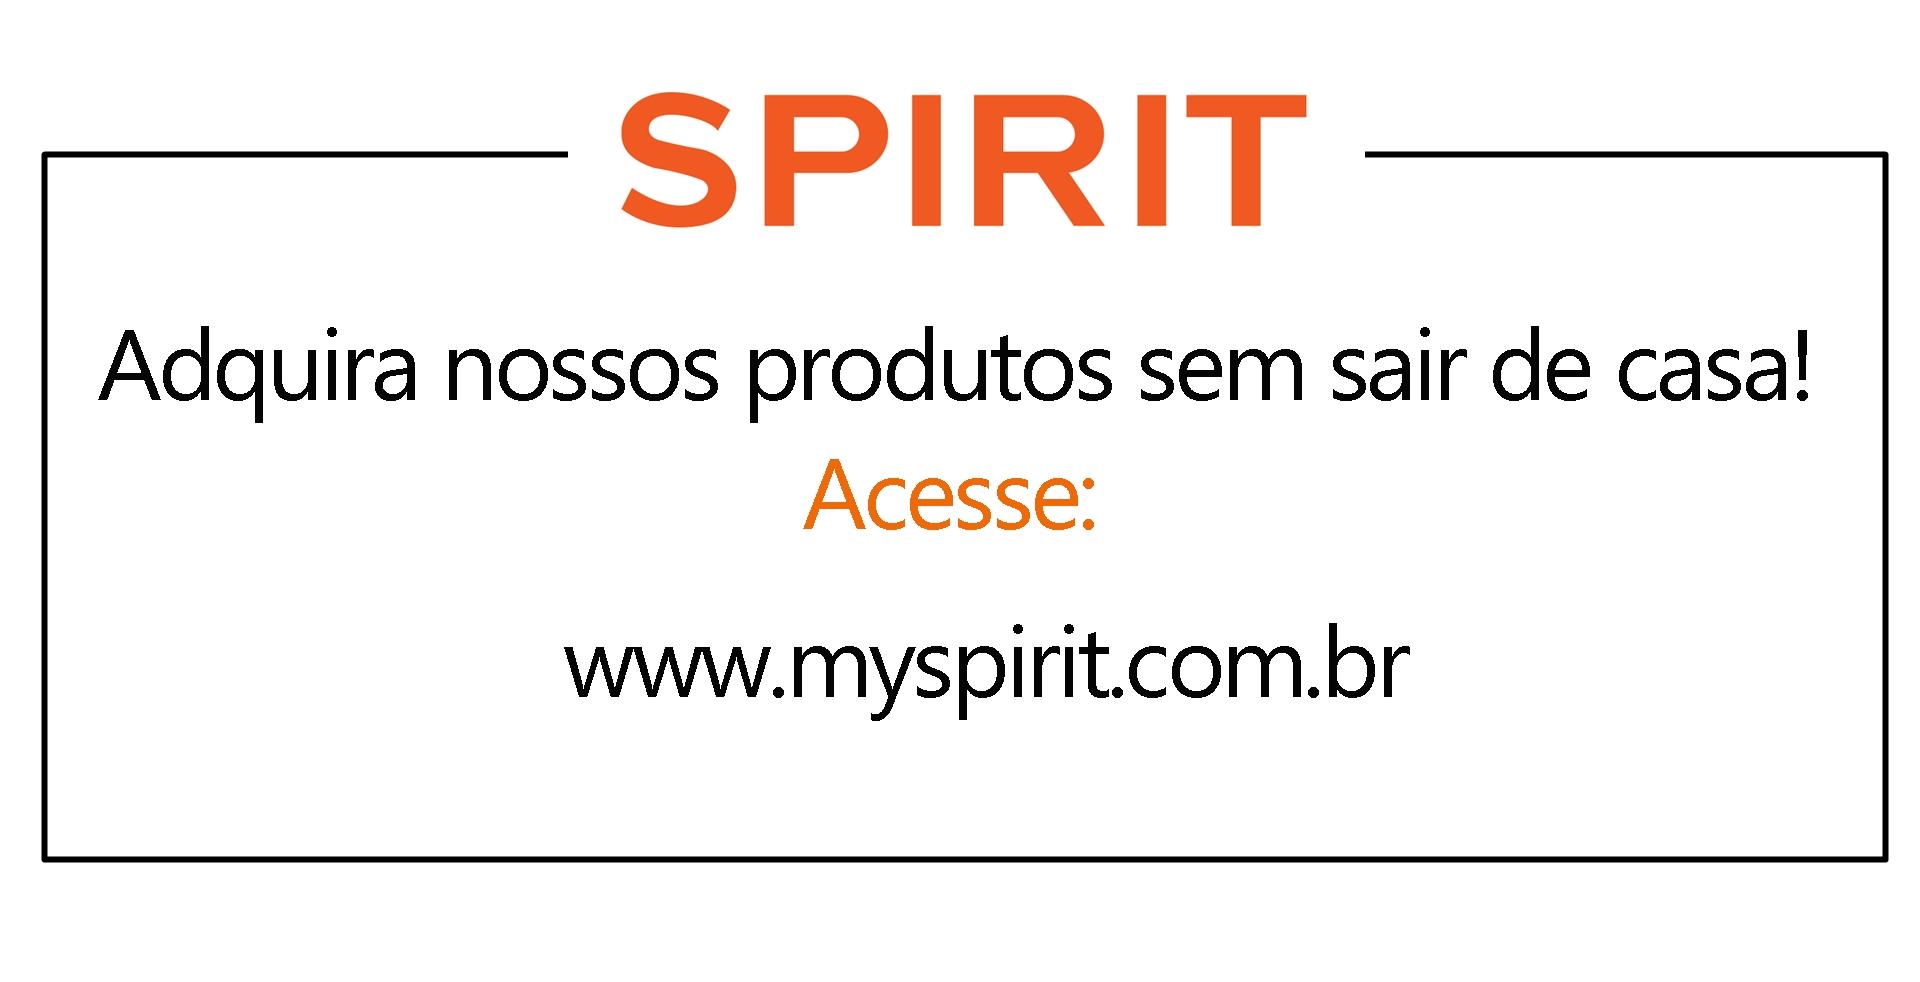 ventilador de teto Spirit - Blog Myspirit - banner site Spirit - Gilson Eletricista